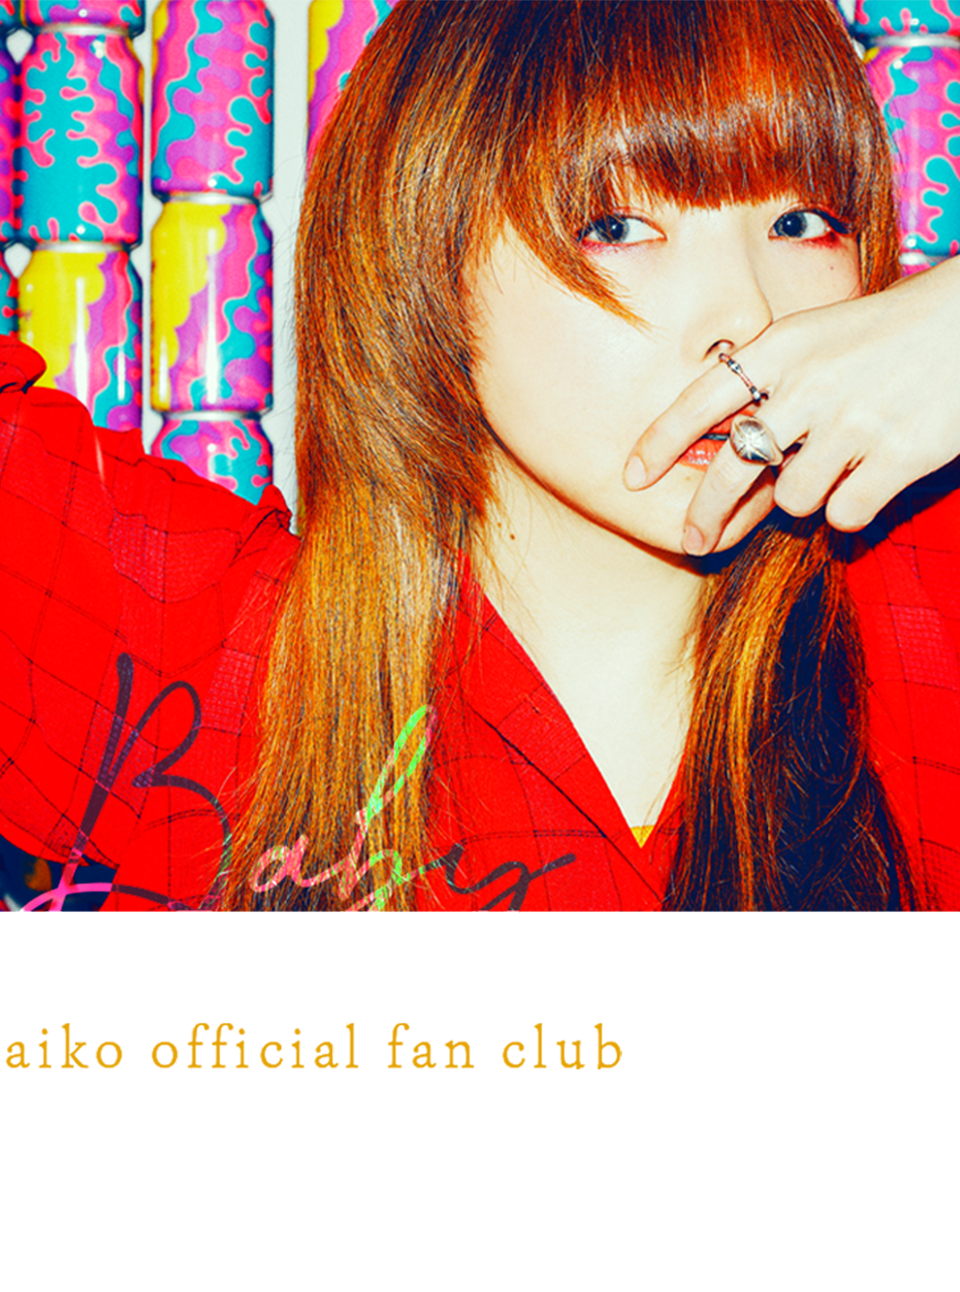 aiko Official fan club 'BABY PEENATS'